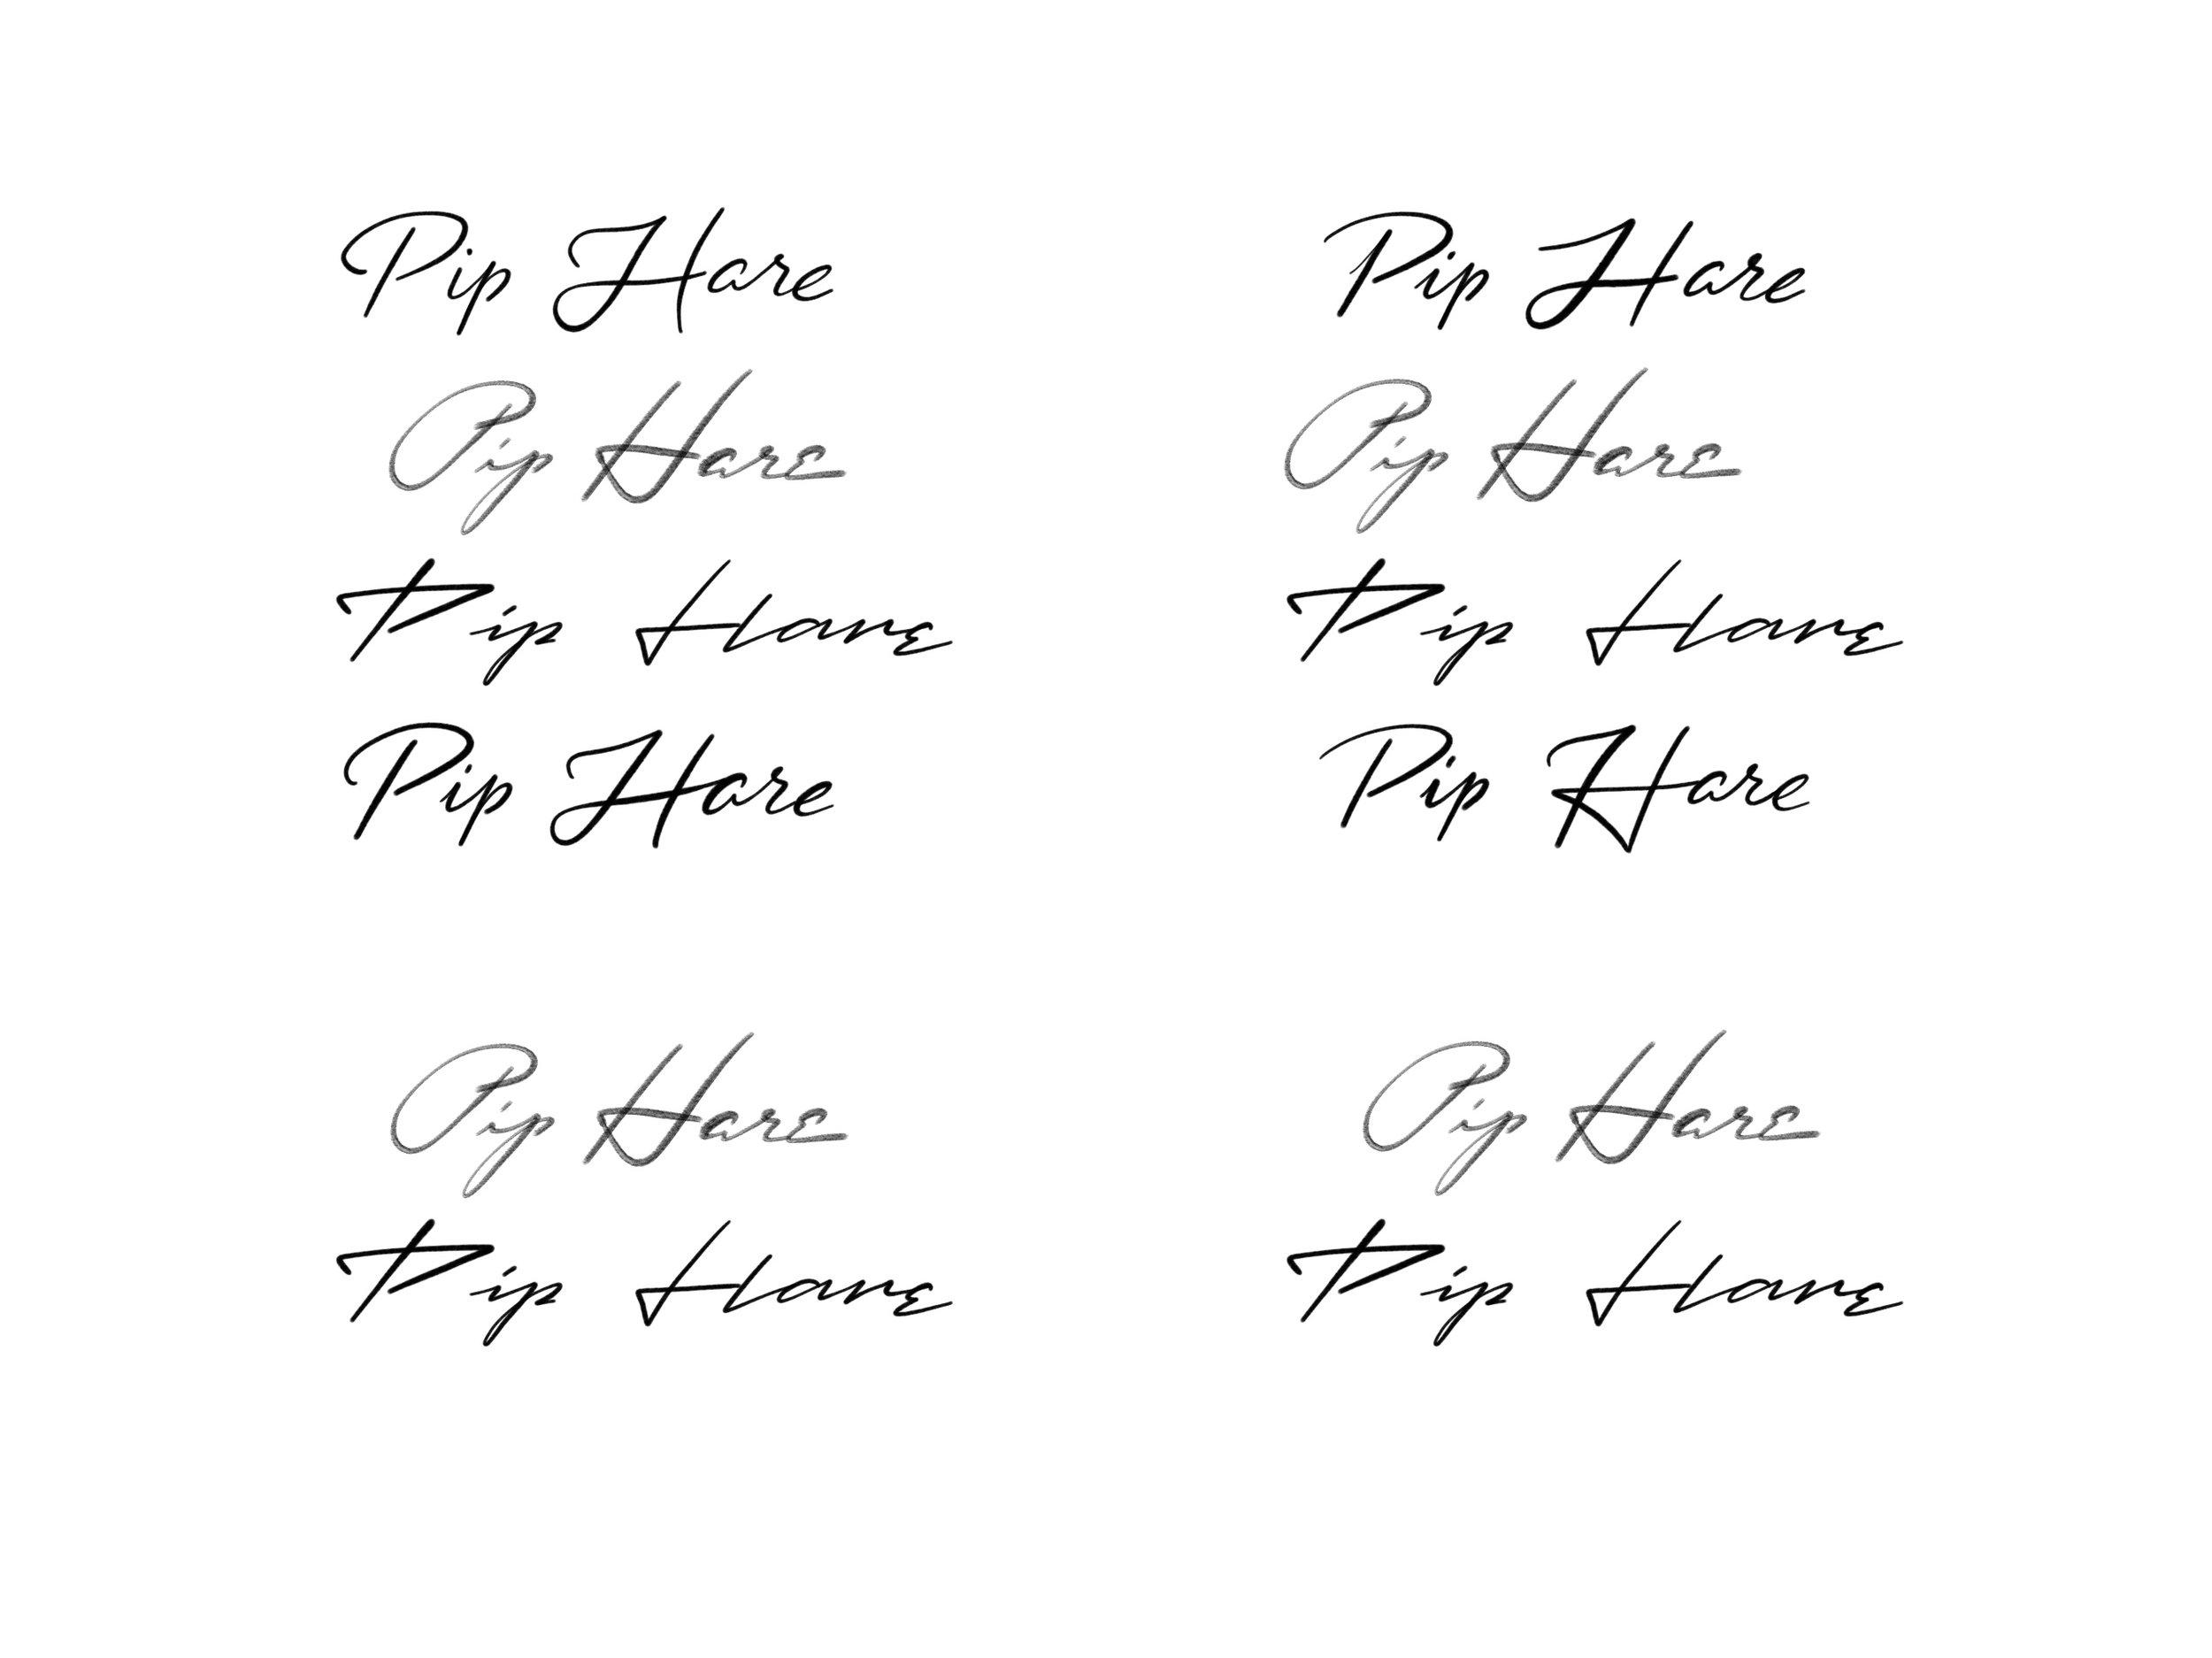 Pete Adams Design Pip Hare Ocean Racing Vendee Logo Concepts.jpg